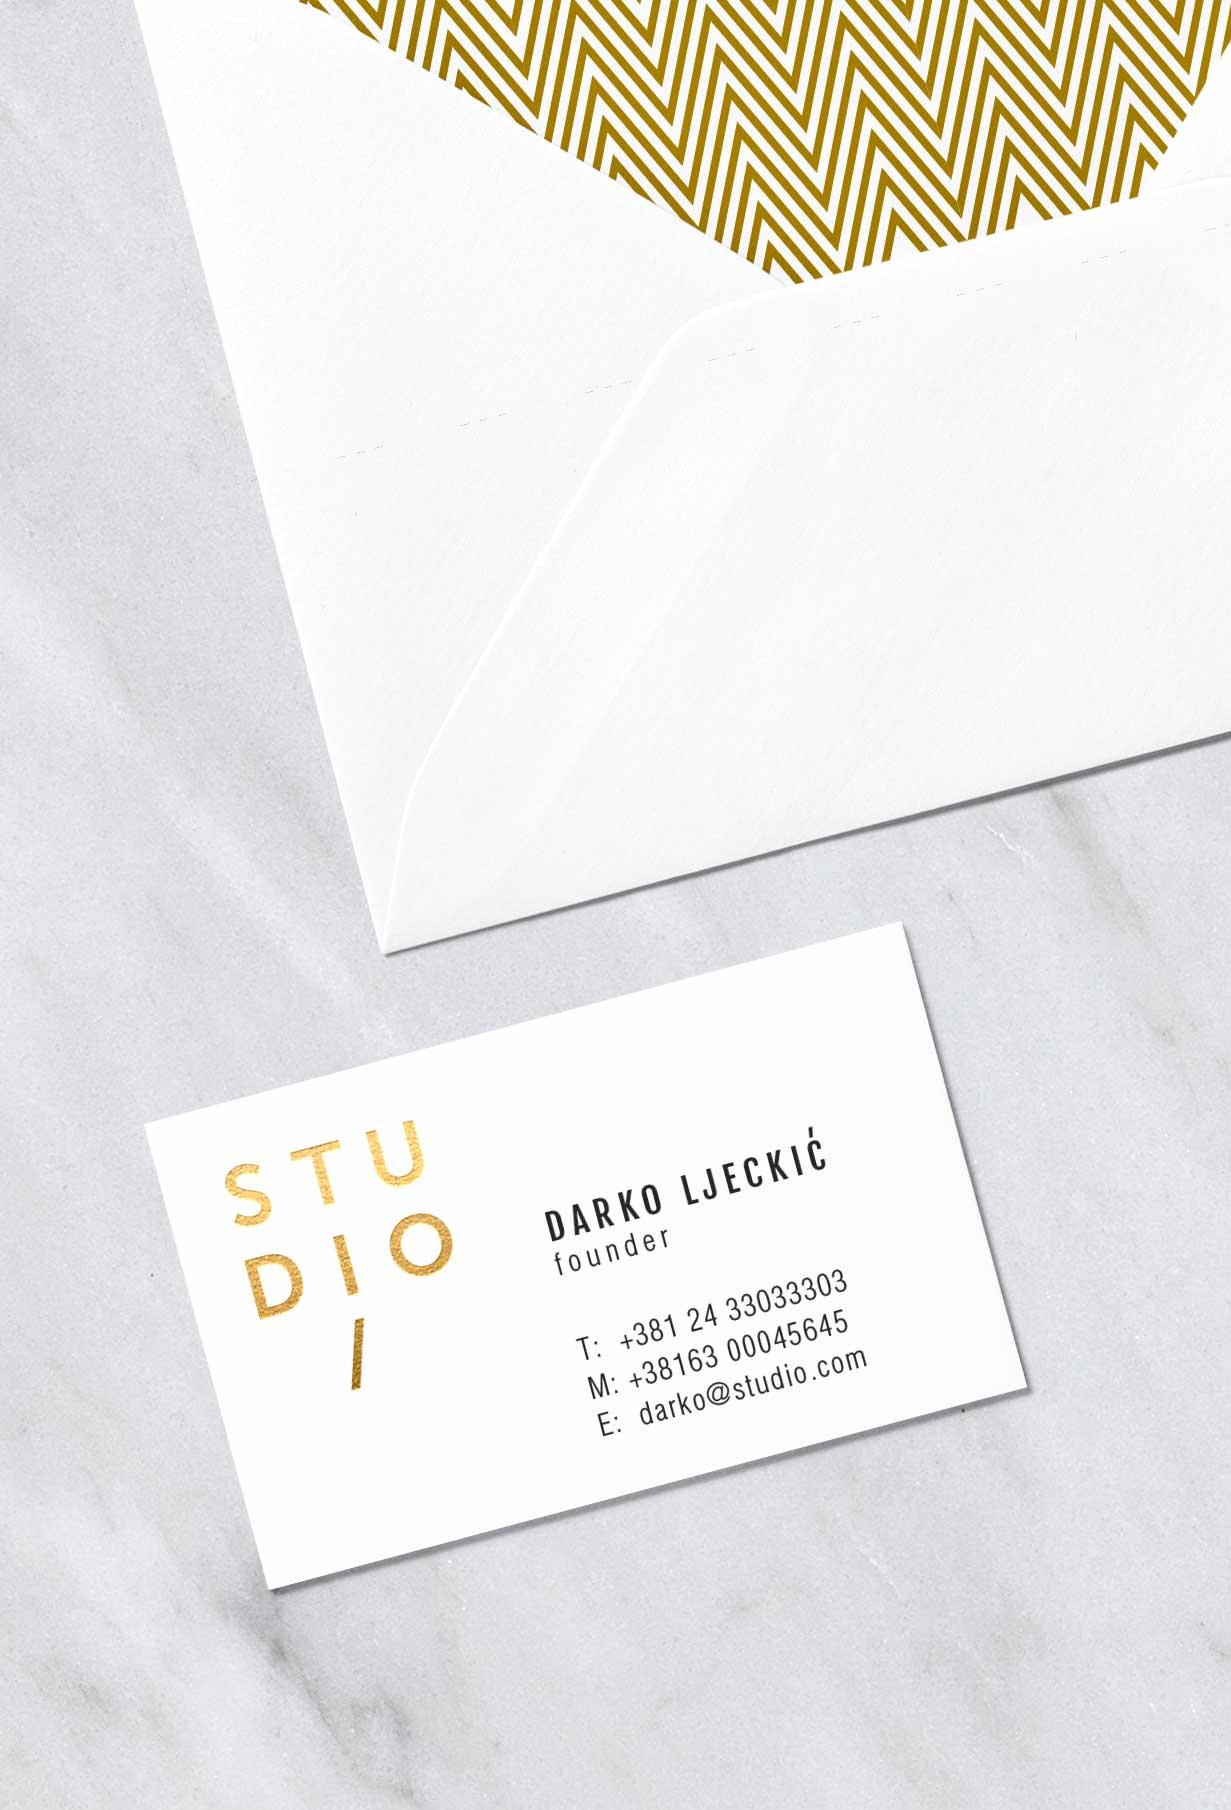 008-studio-apostolovic